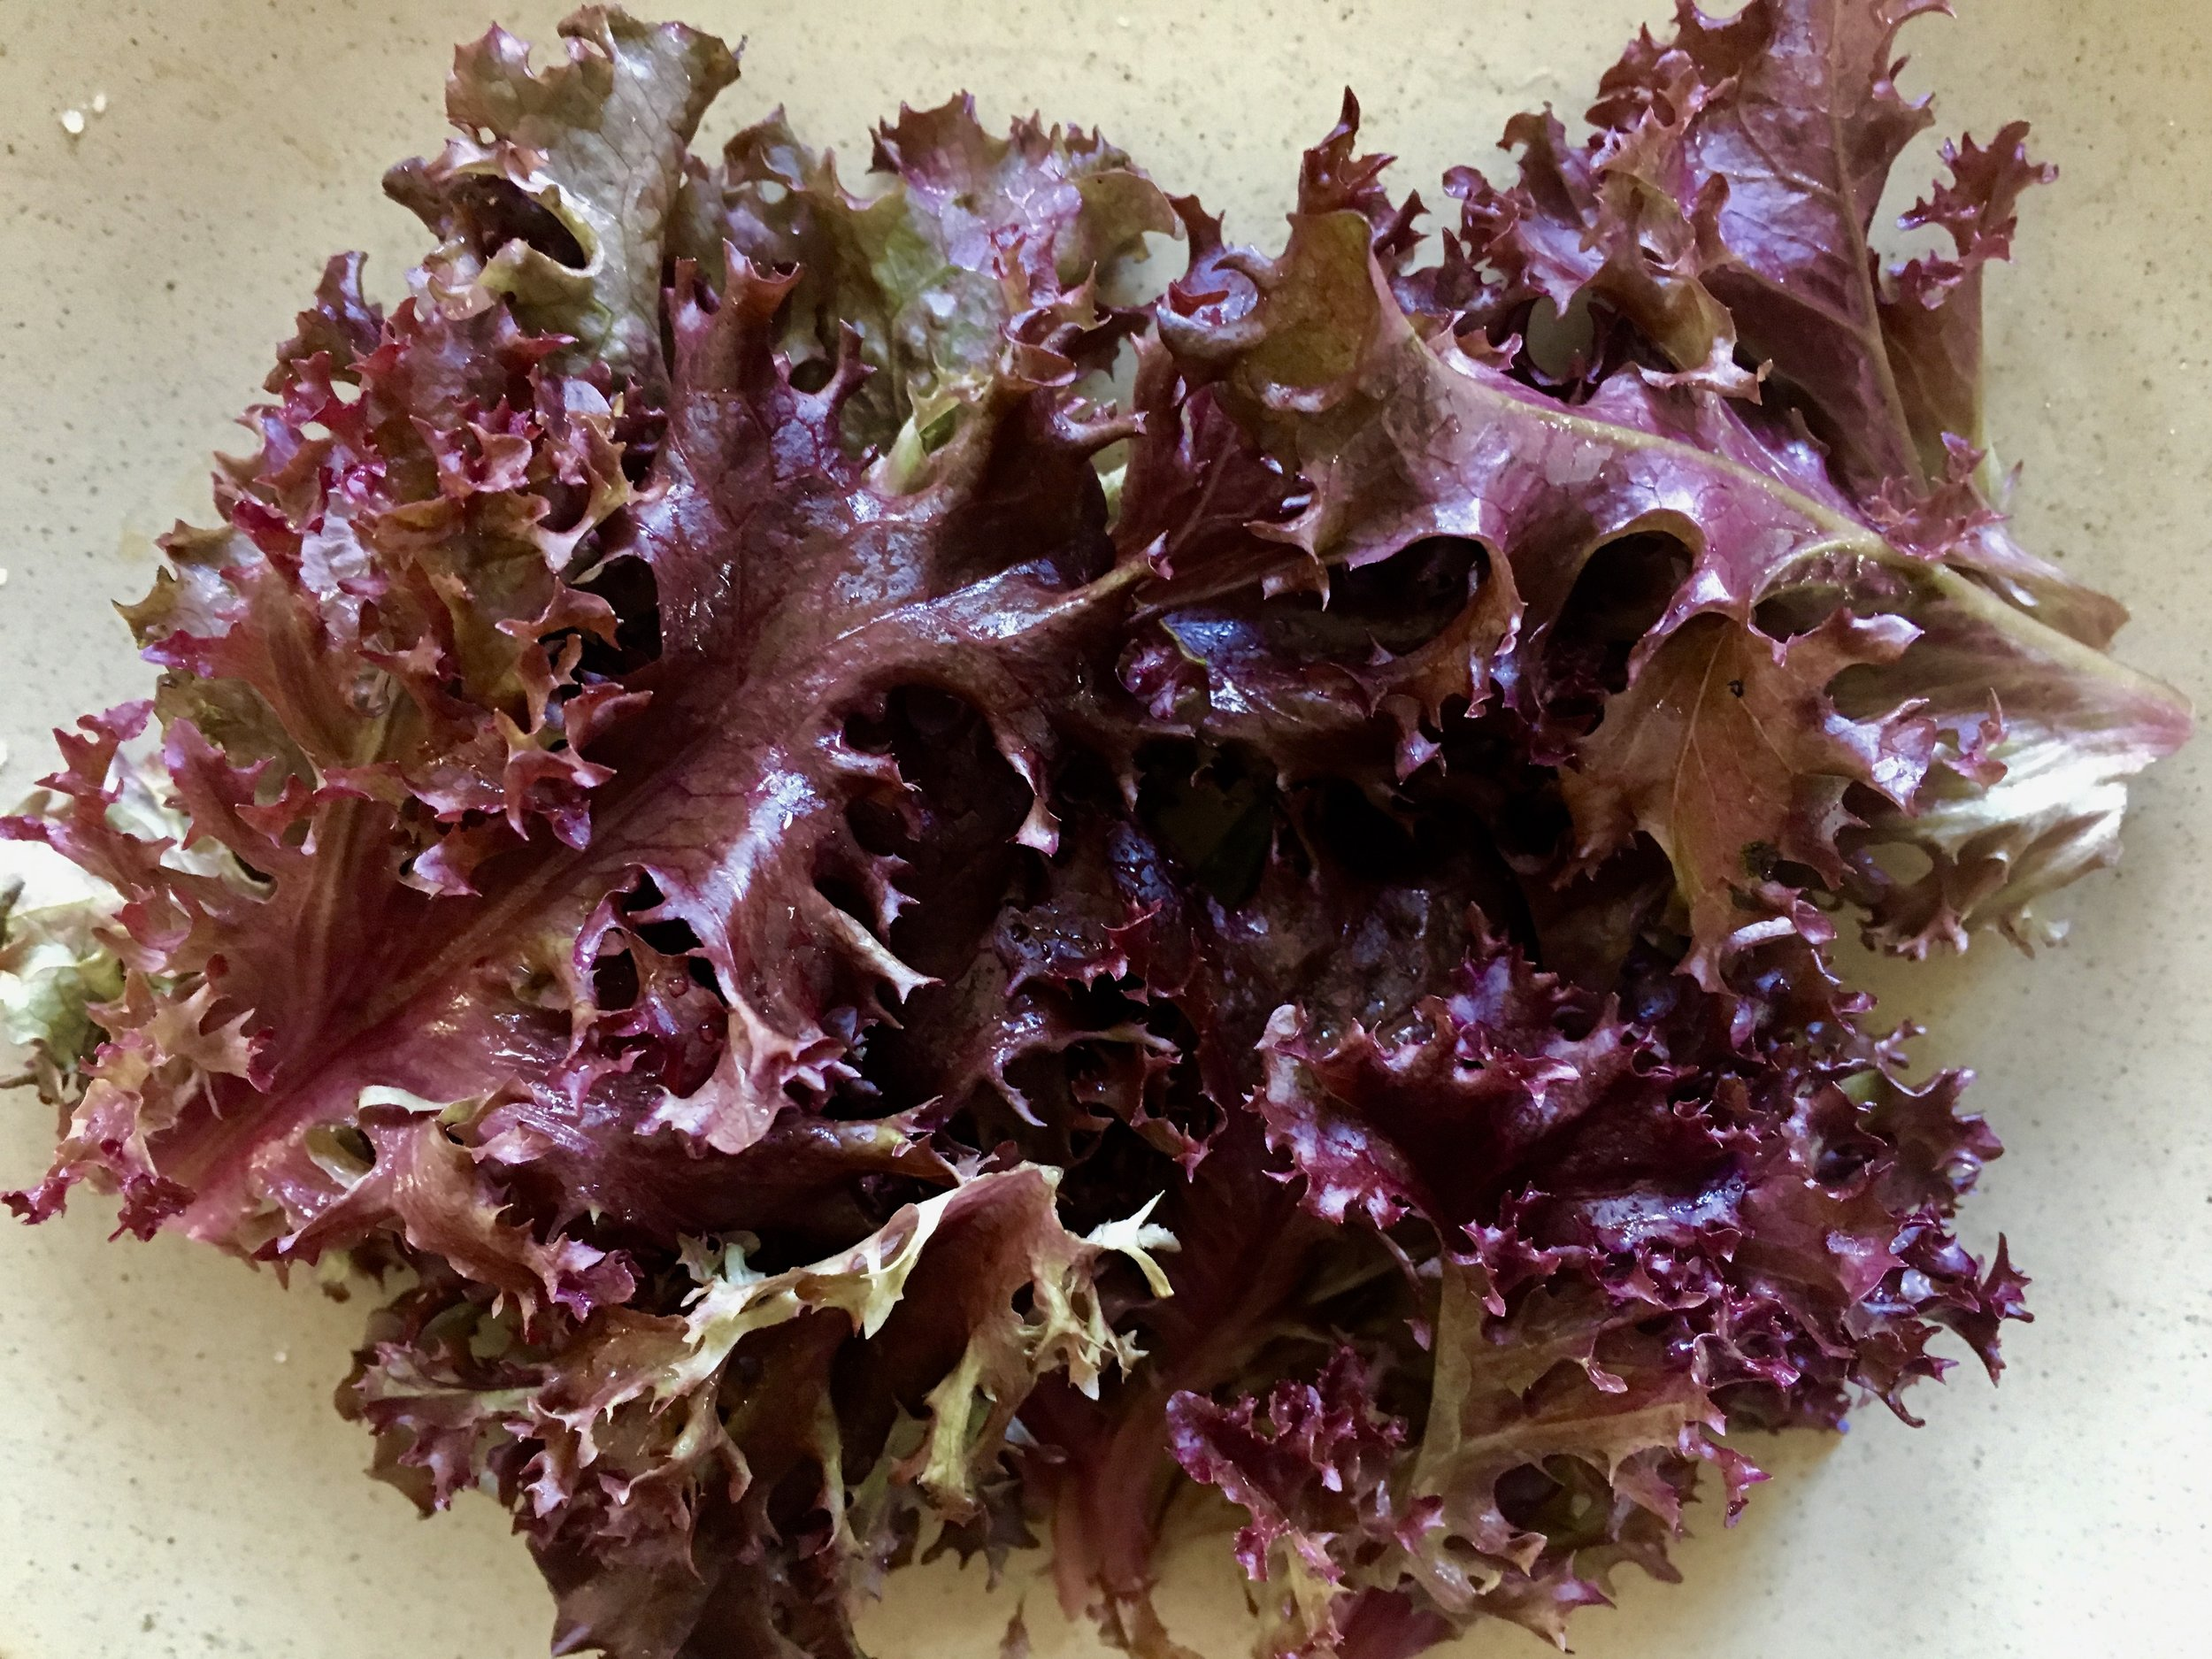 Lolla rossa lettuce